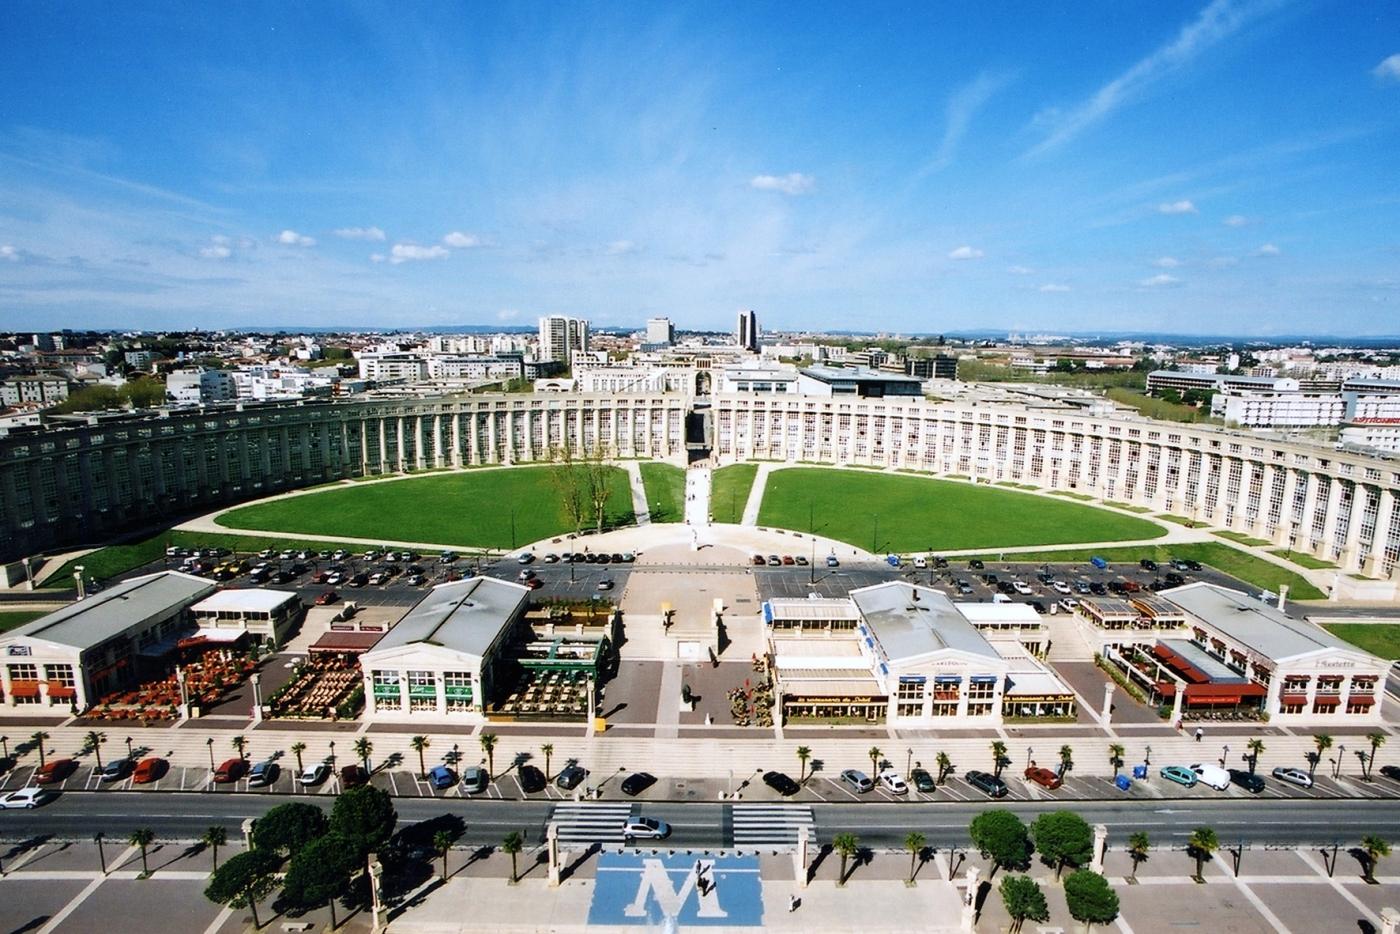 Montpellier tourisme arts et voyages for Piscine montpellier